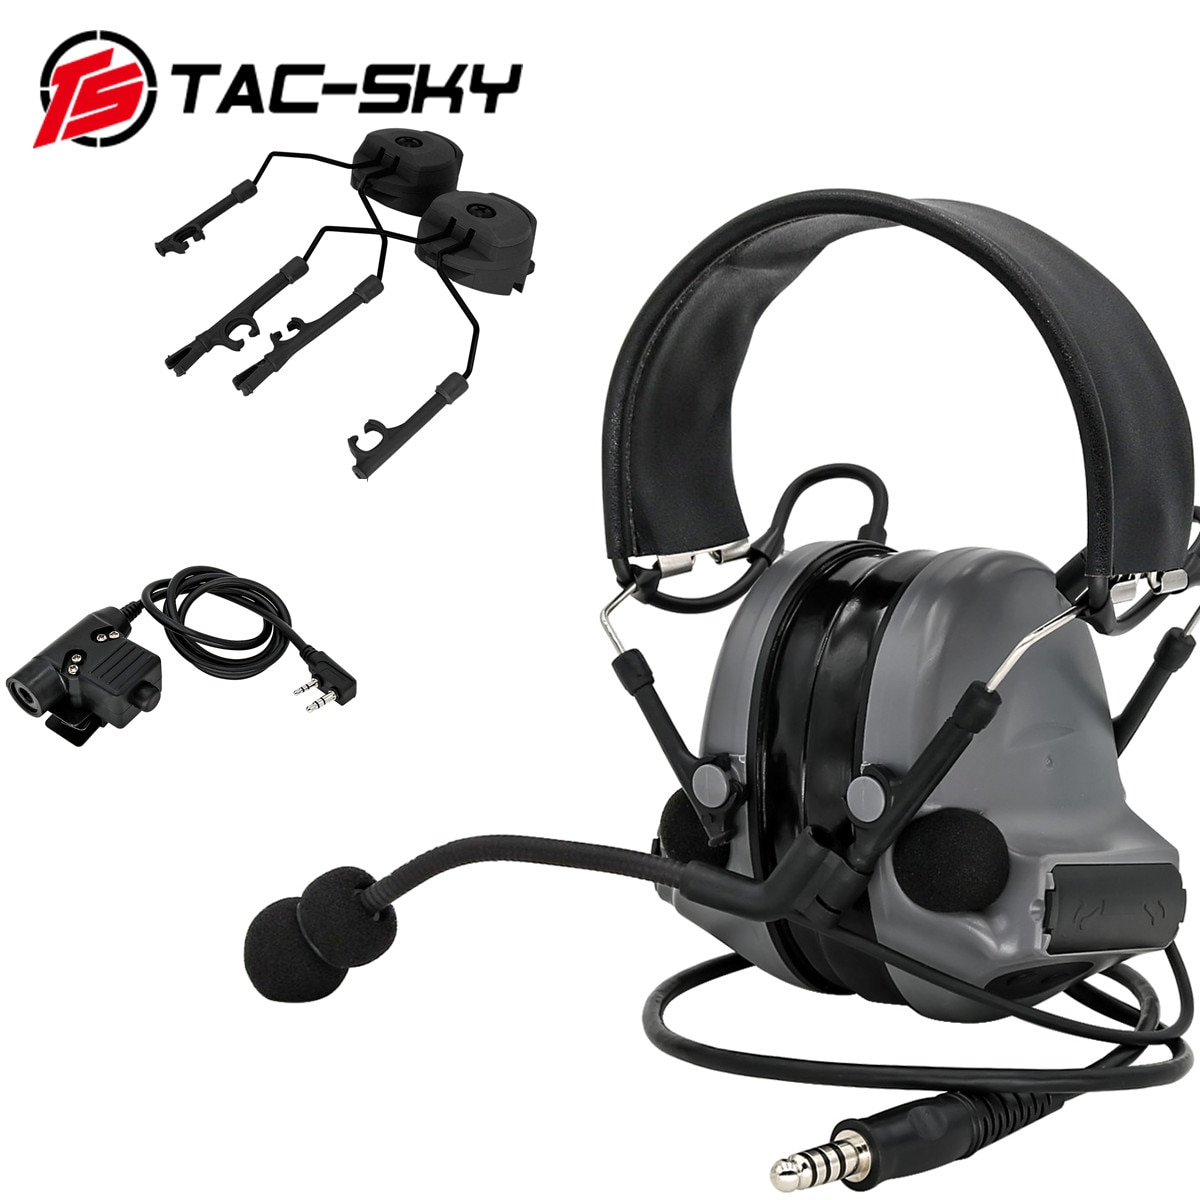 TAC-SKY tactical noise reduction shooting headset COMTAC II headset + tactical PTT U94 PTT+ARC helmet track comtac bracket  GRAY